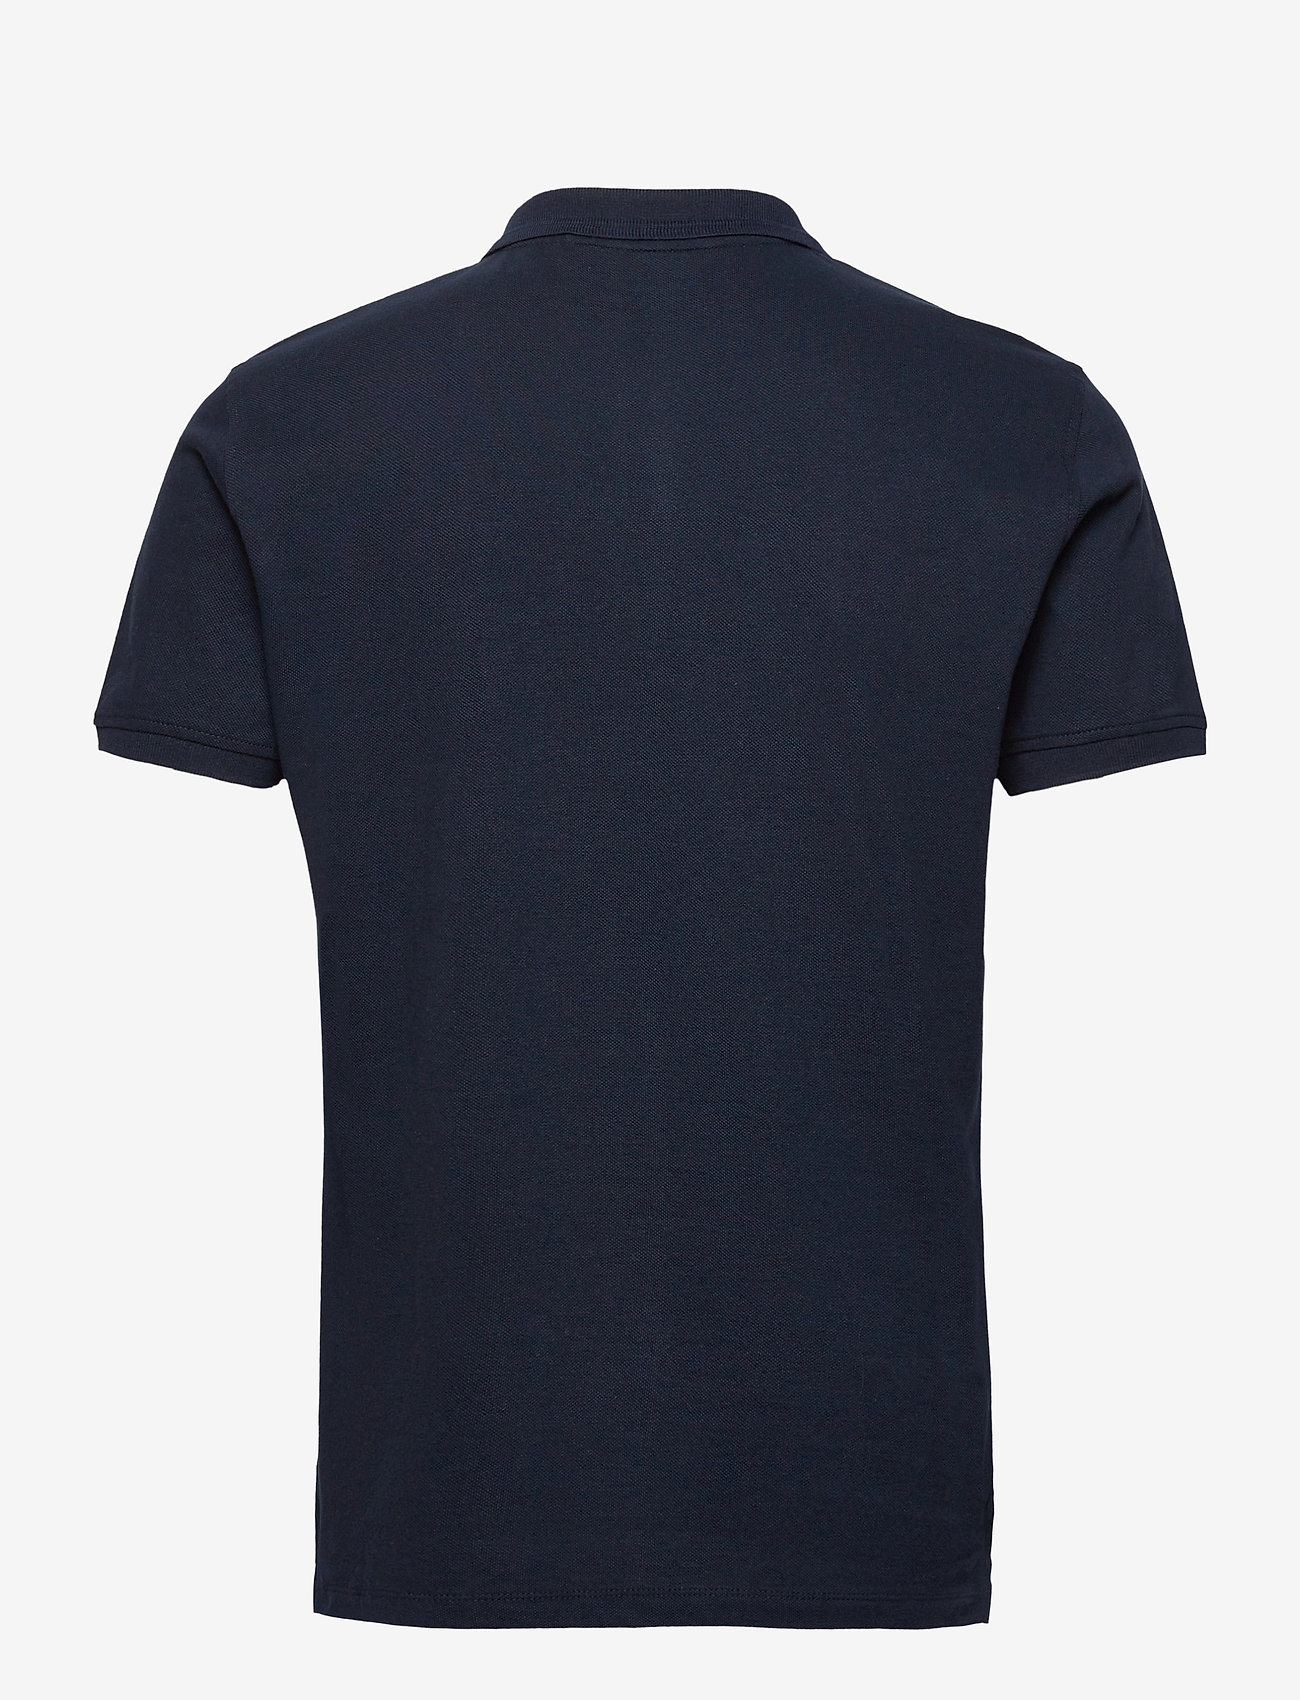 Blend - Poloshirt - poloshirts - dress blues - 1